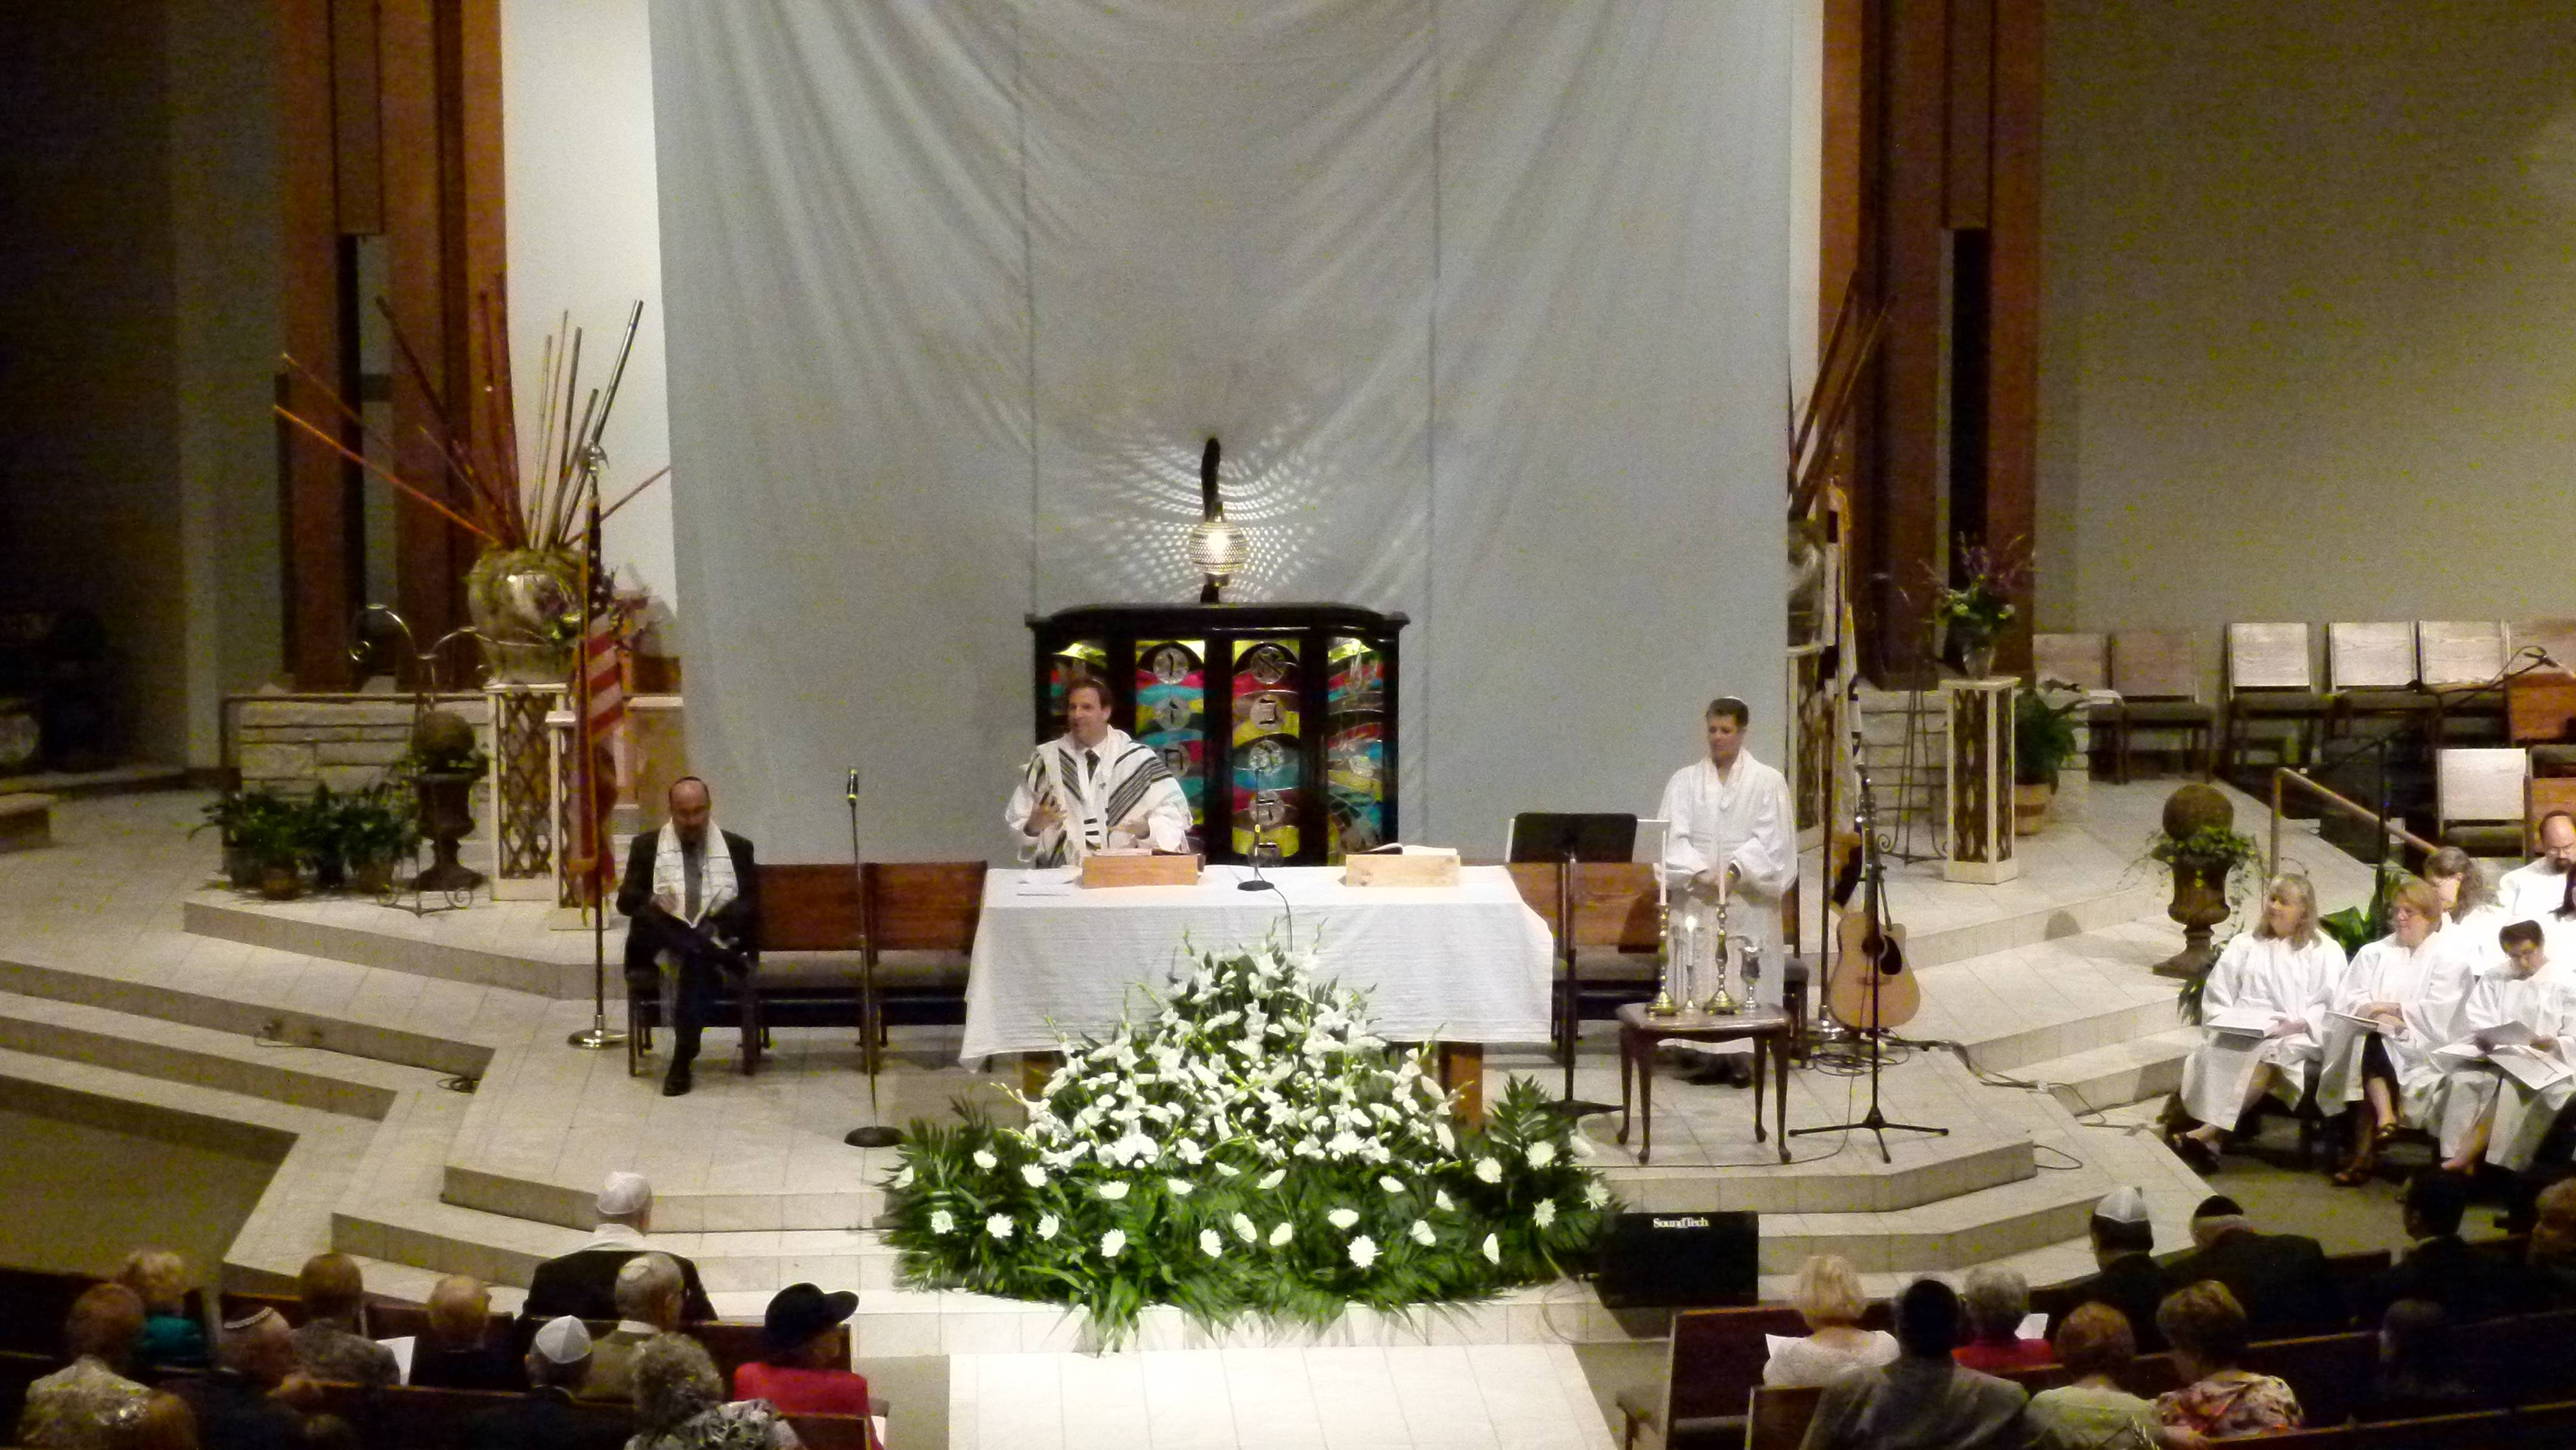 Jews observe High Holy Days in Catholic church